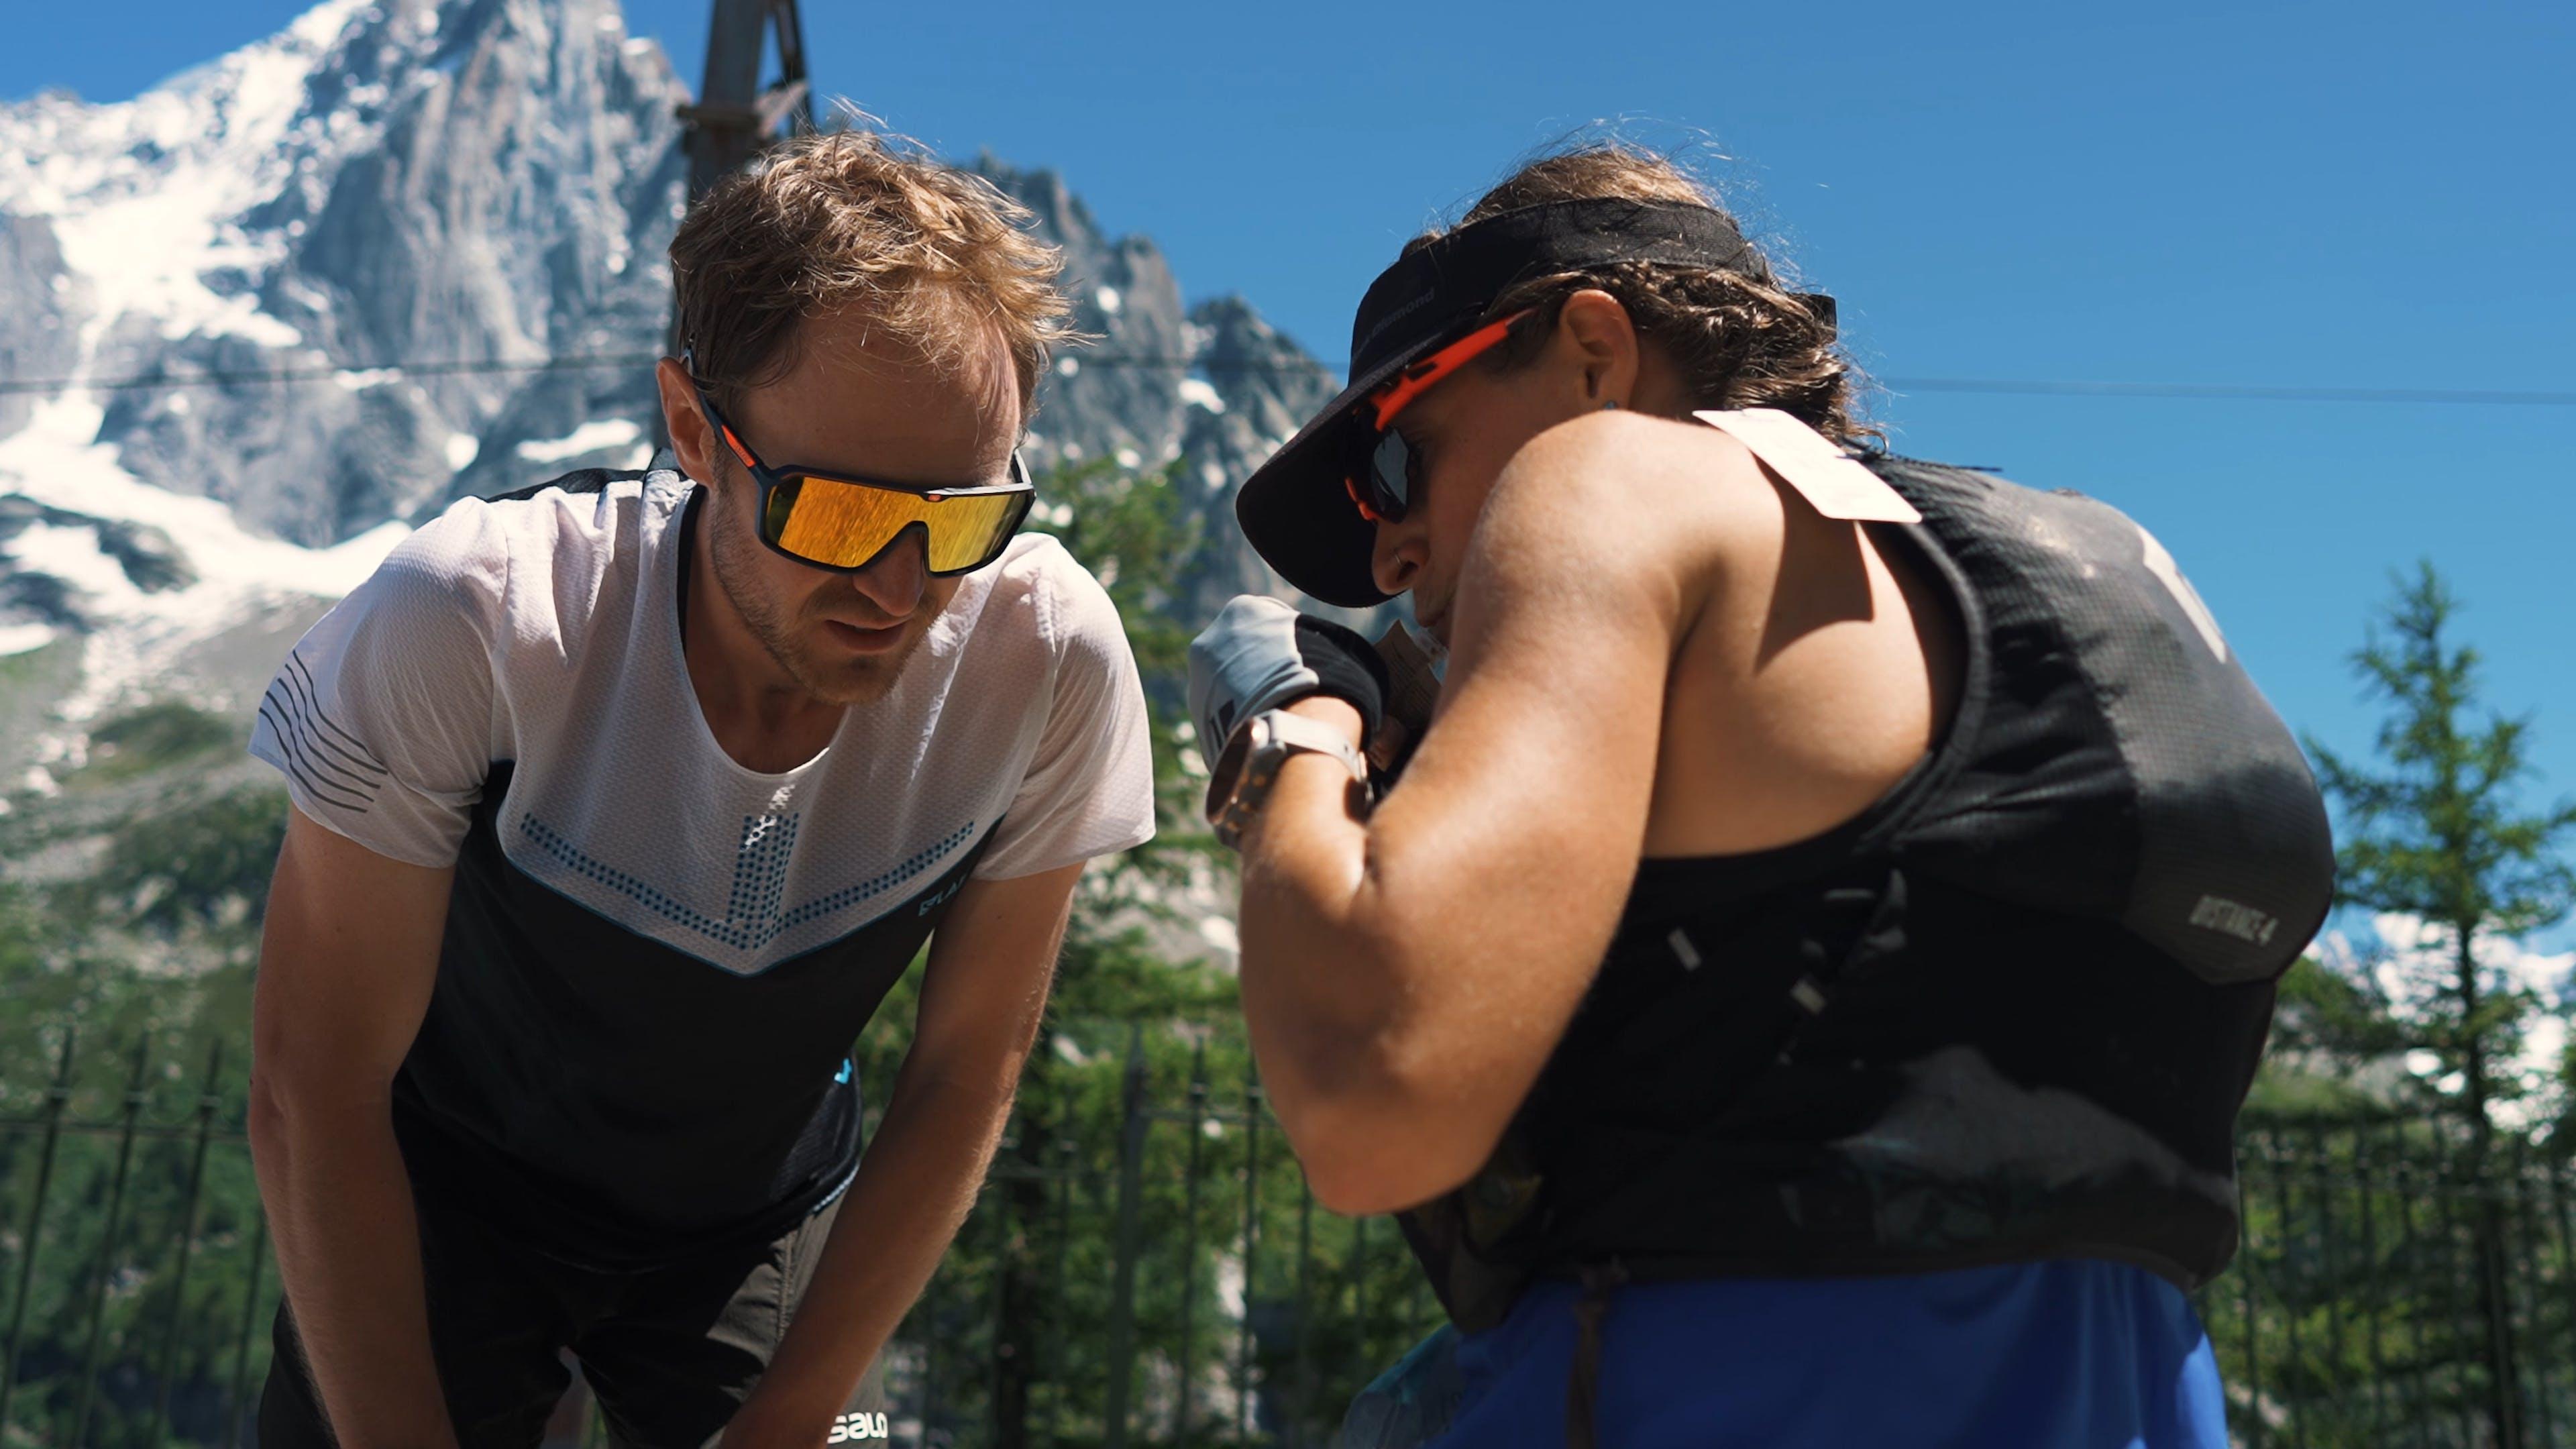 Black Diamond athlete Hillary Gerardi at an aid station during the 90k du Mont Blanc